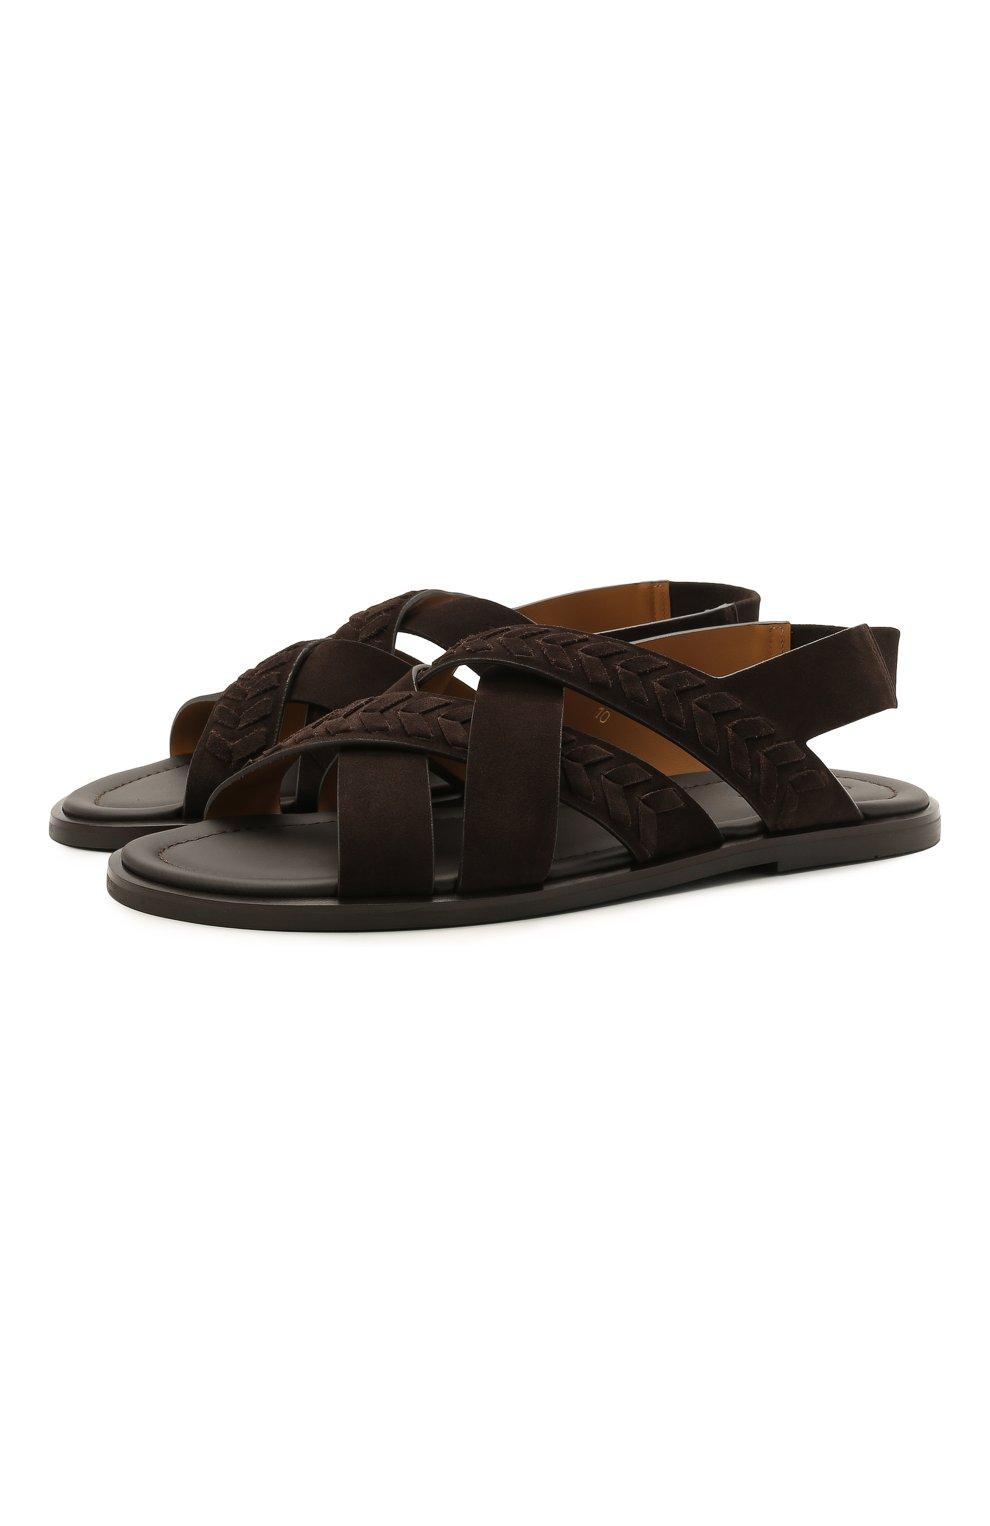 Мужские замшевые сандалии GIORGIO ARMANI коричневого цвета, арт. X2P073/XM818 | Фото 1